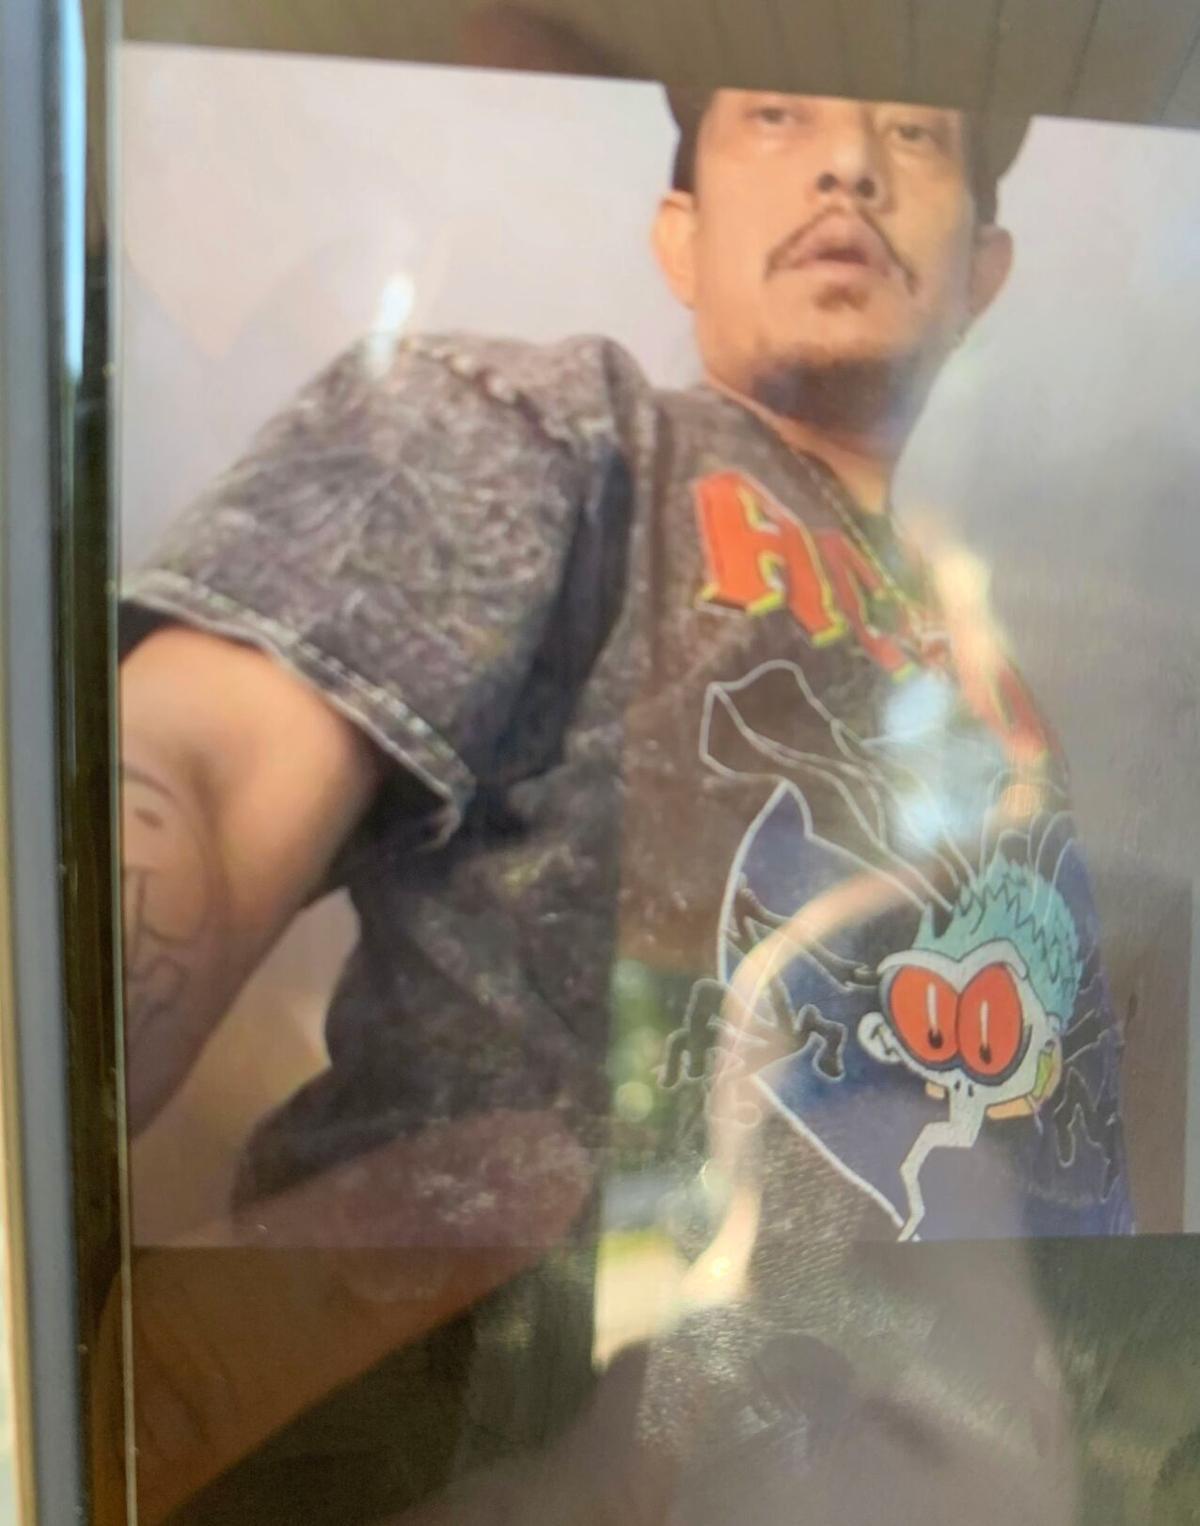 120220_MNS_missing_man_001 Marlon Ivan Lopez Guerrero